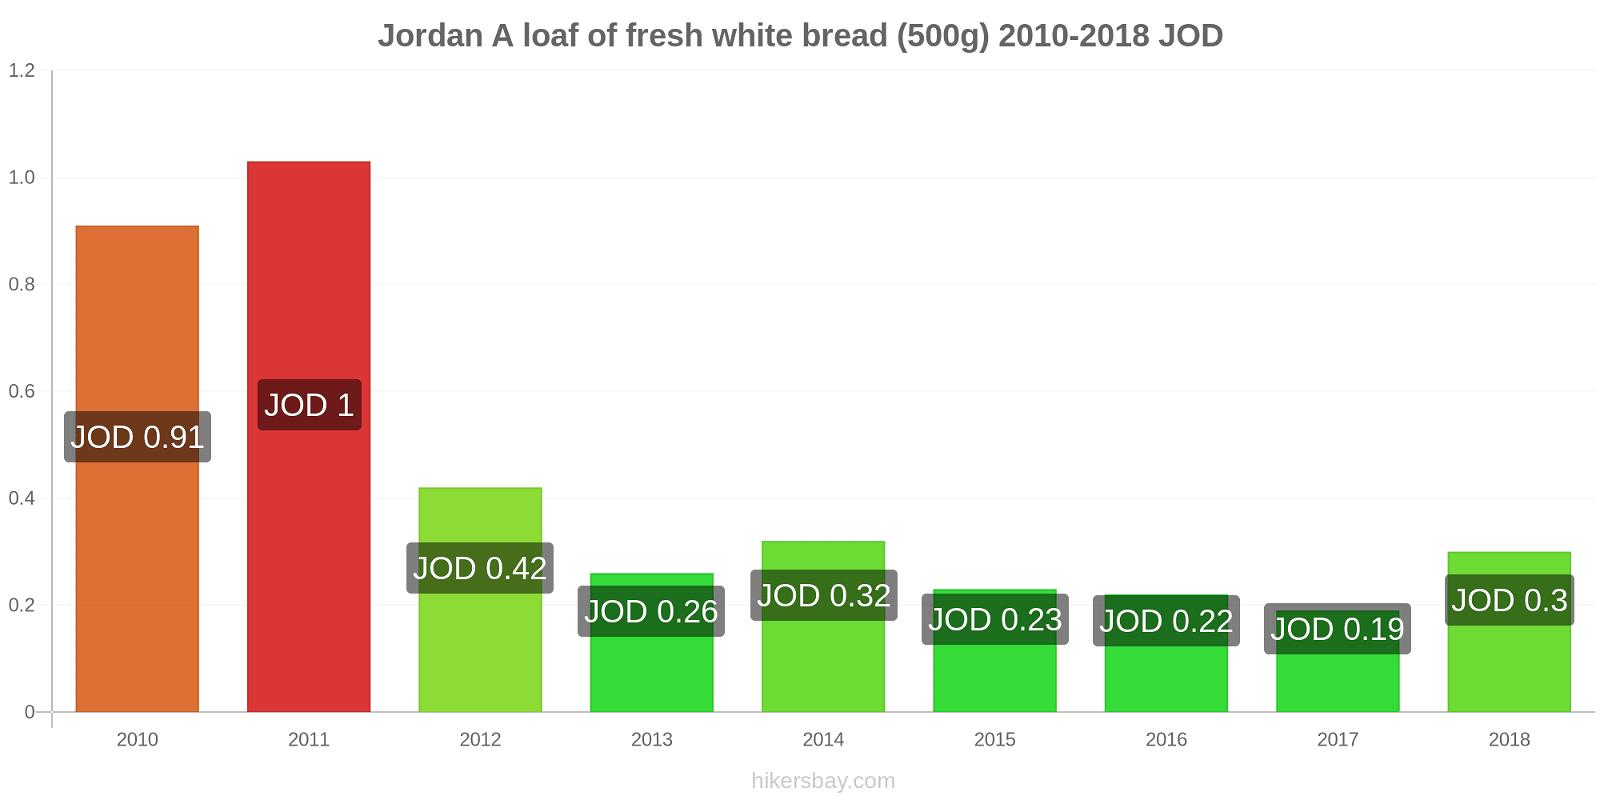 Jordan price changes A loaf of fresh white bread (500g) hikersbay.com